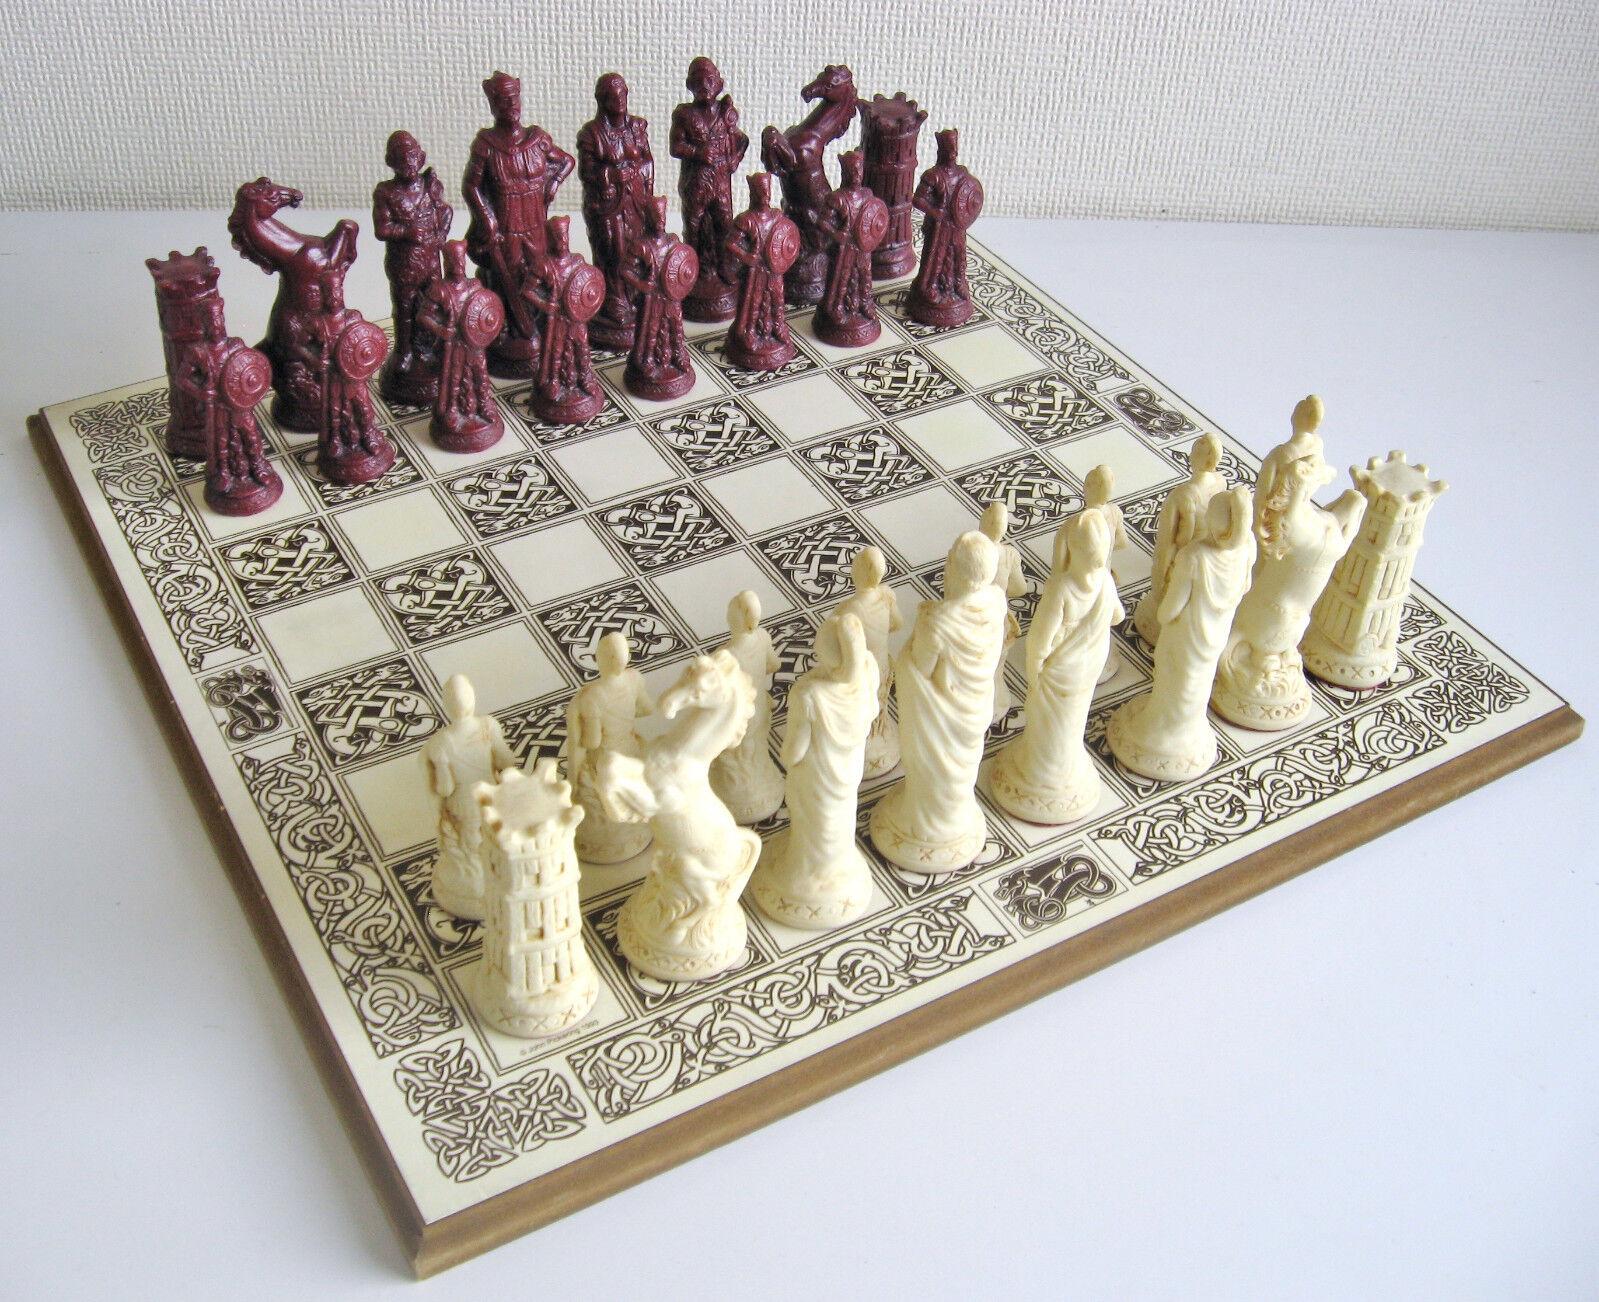 Vintage Roman vs Gauls (Celts) Chess Set